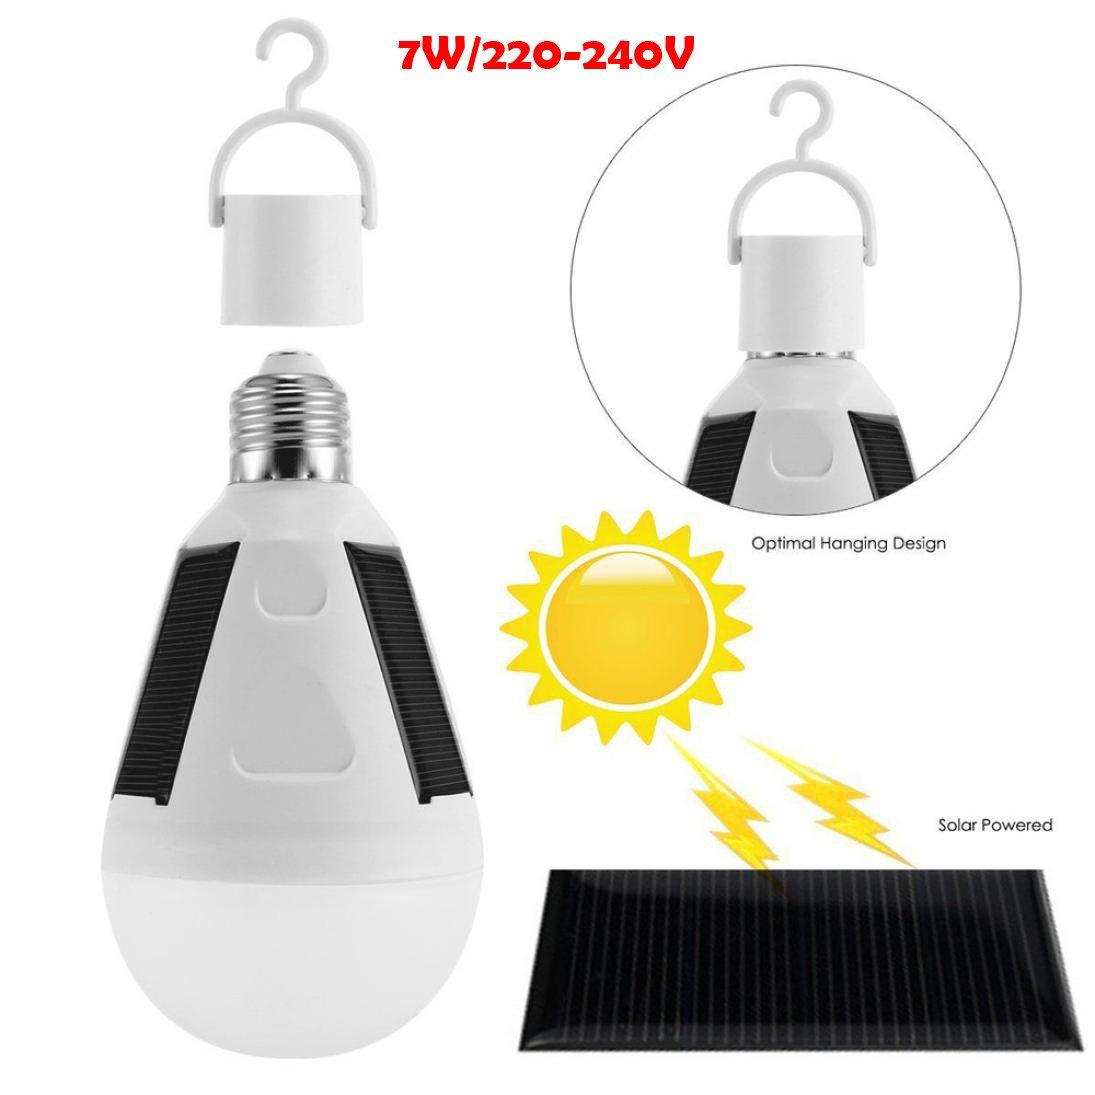 LED Solar Light Bulb 7W E27 Tent Outdoor Camping Fishing Solar Lamp